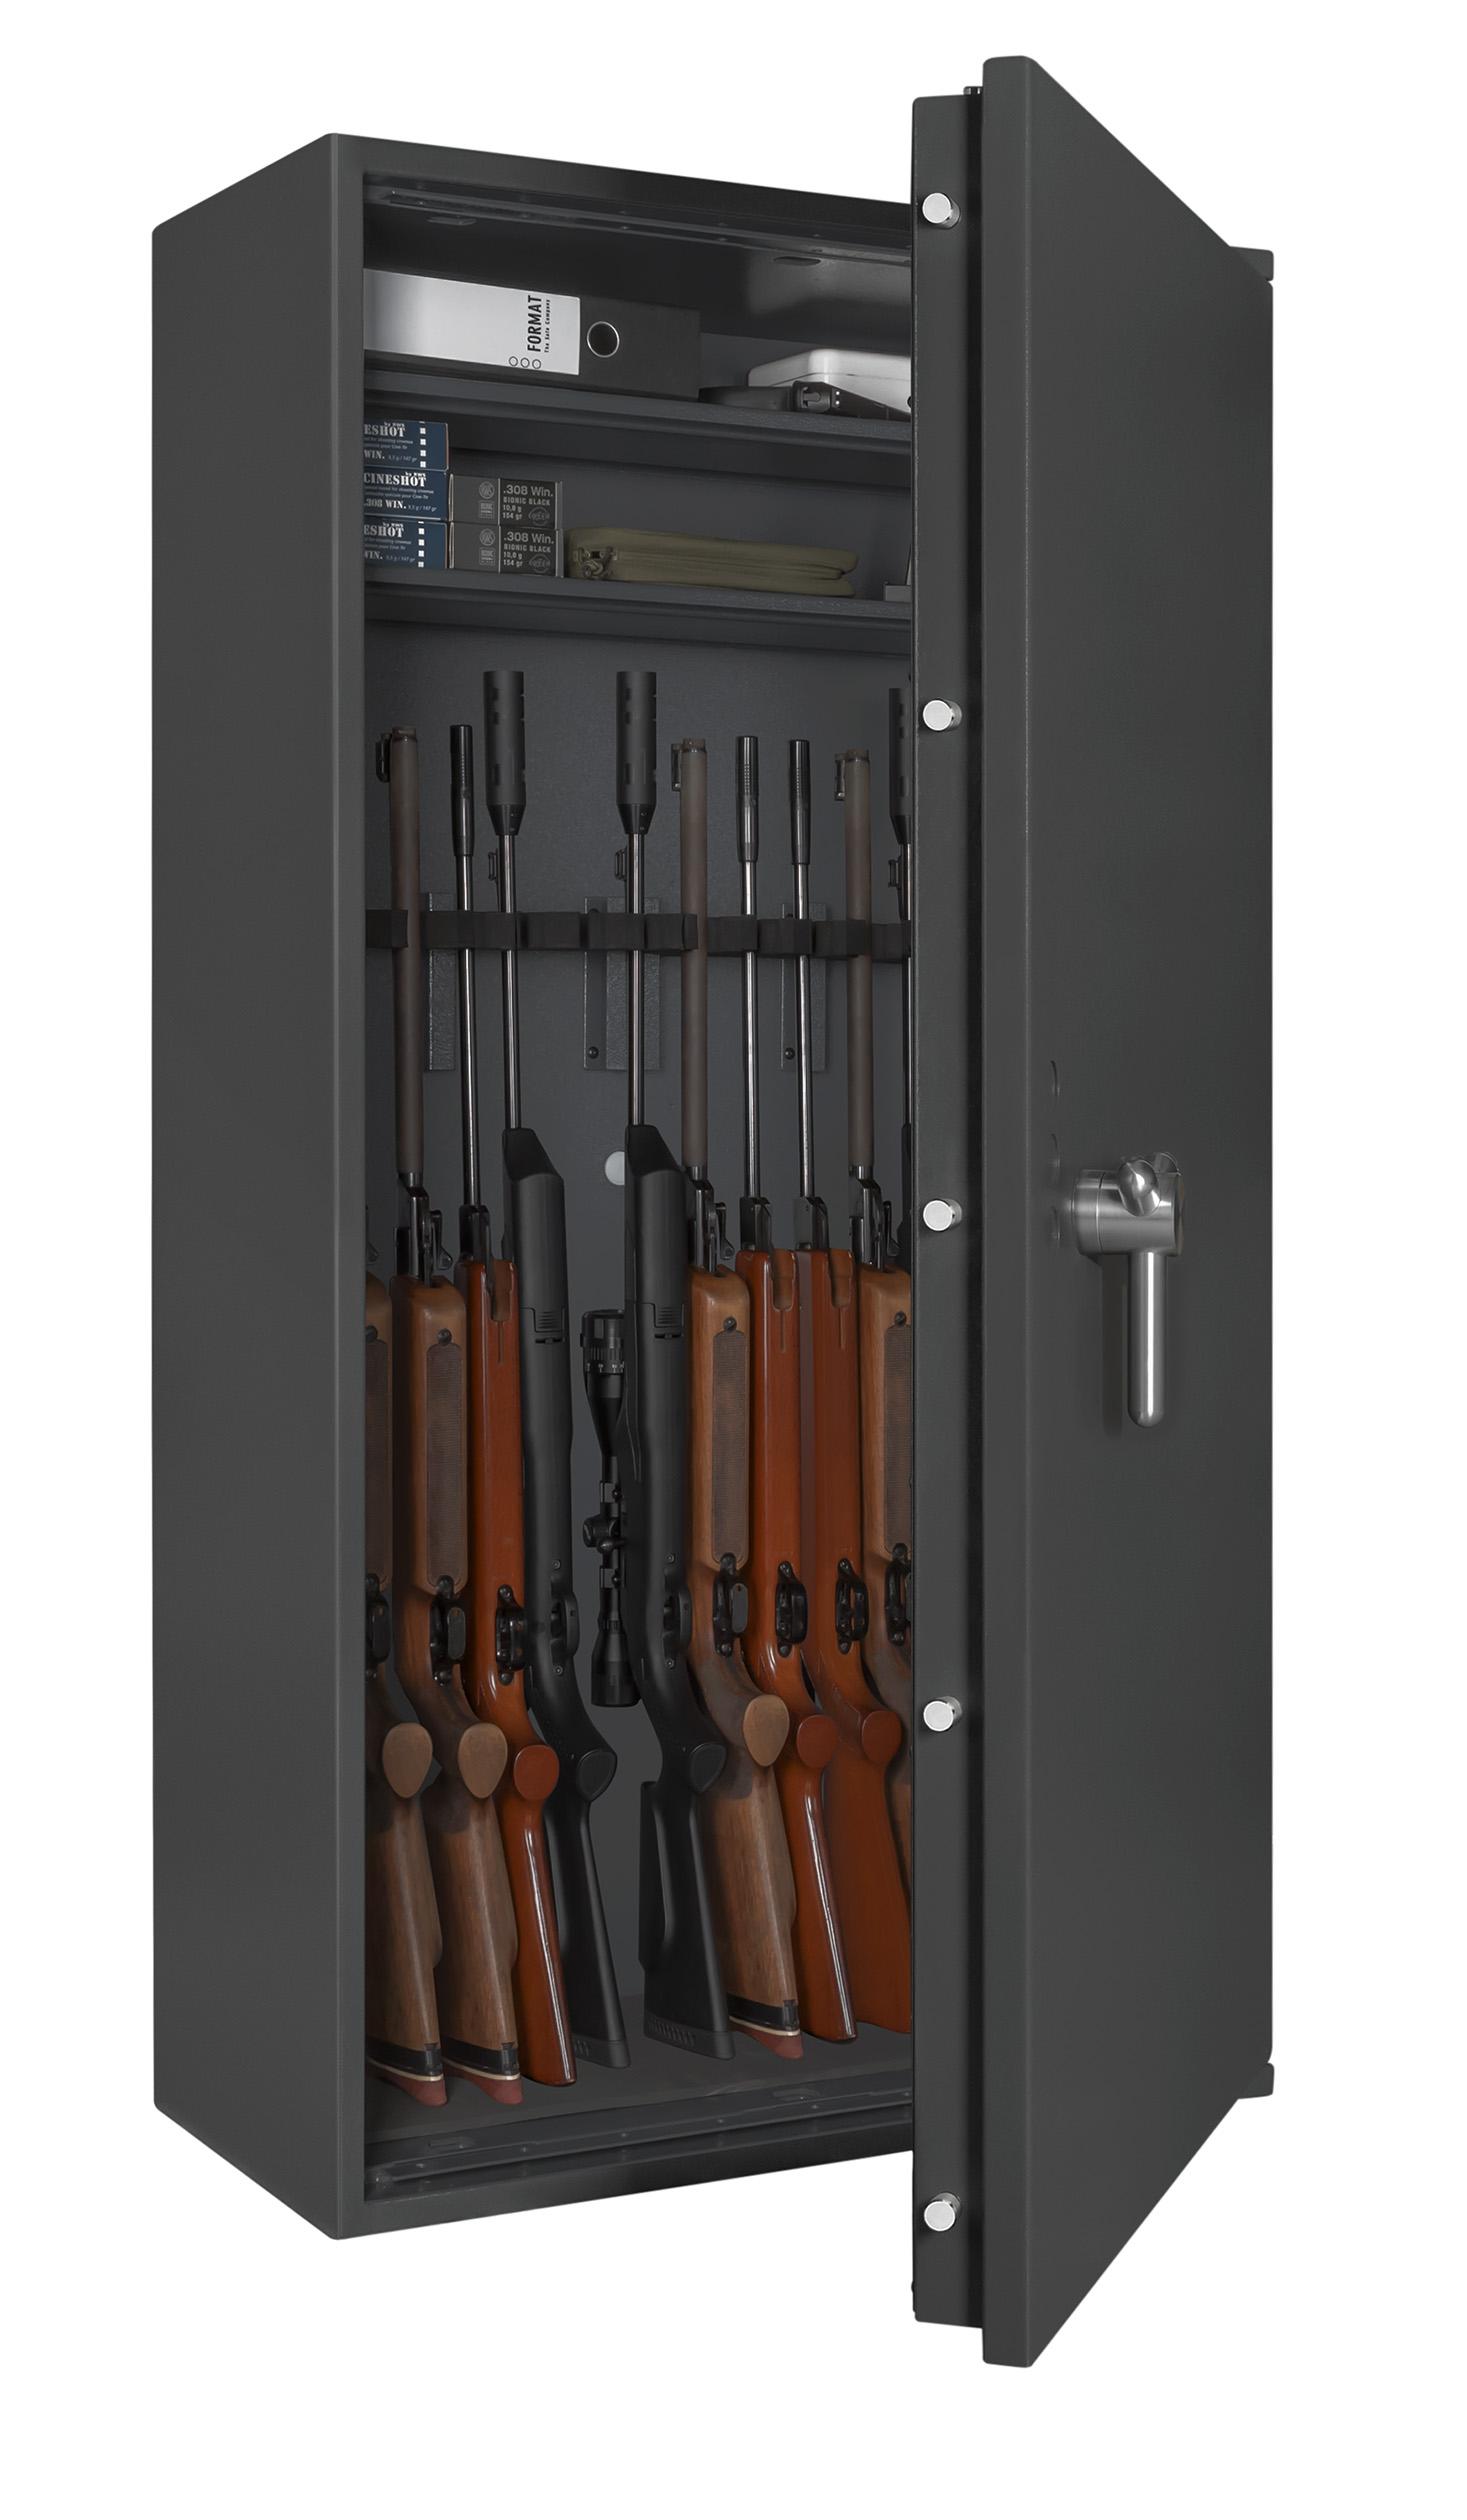 format capriolo waffenschrank en 1143 1 capriolo 4 f r 14 langwaffen kurzwaffen und munition. Black Bedroom Furniture Sets. Home Design Ideas